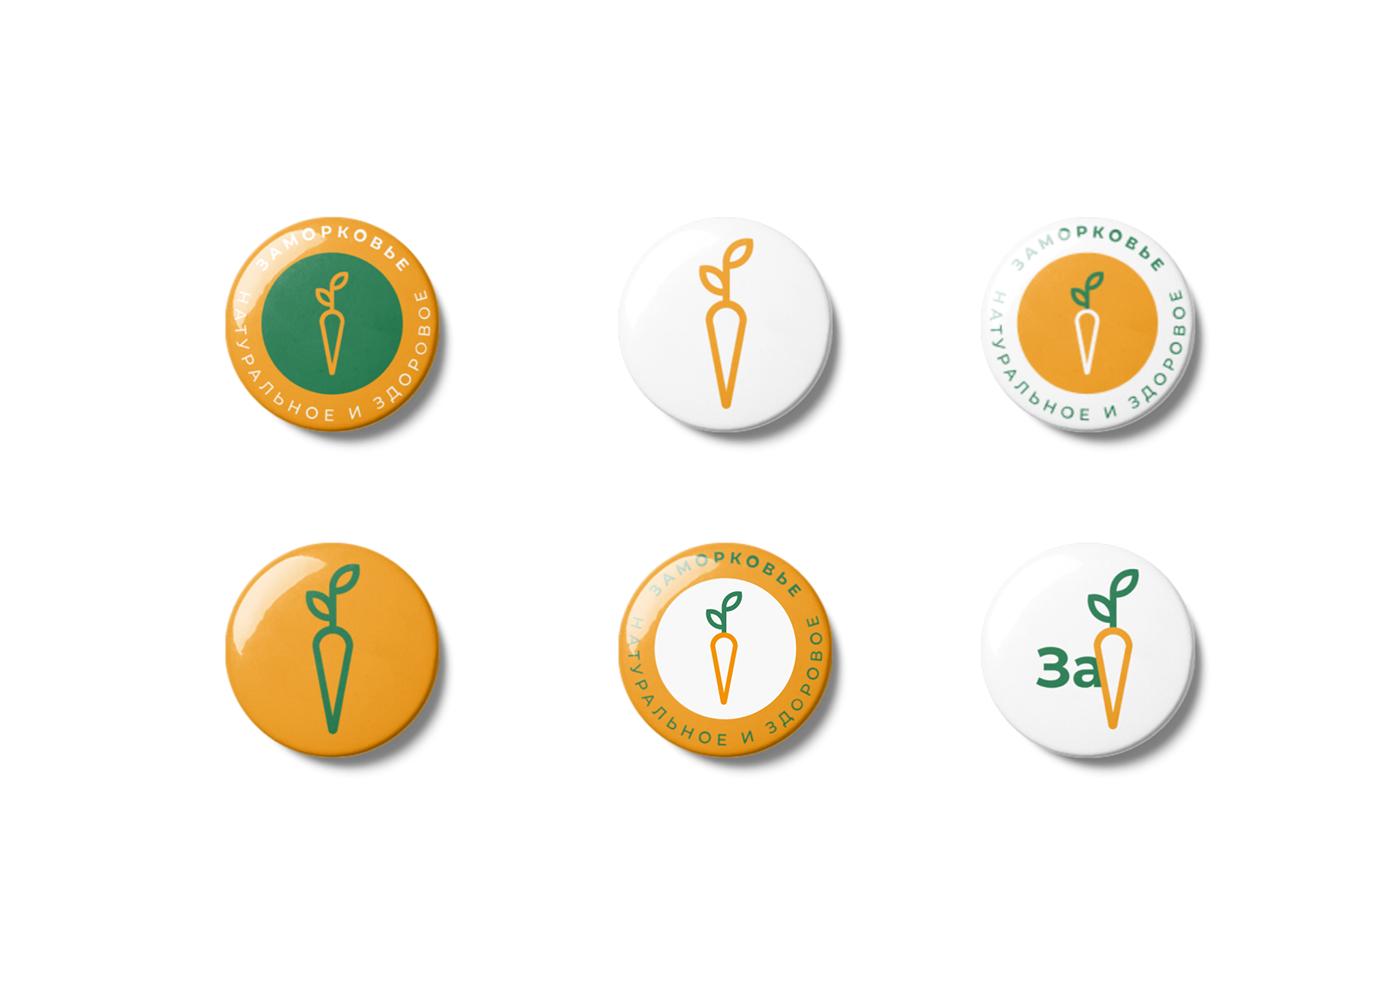 #shop #farm #brand #Name #Logo #serenity #packing #naming #healthy #food